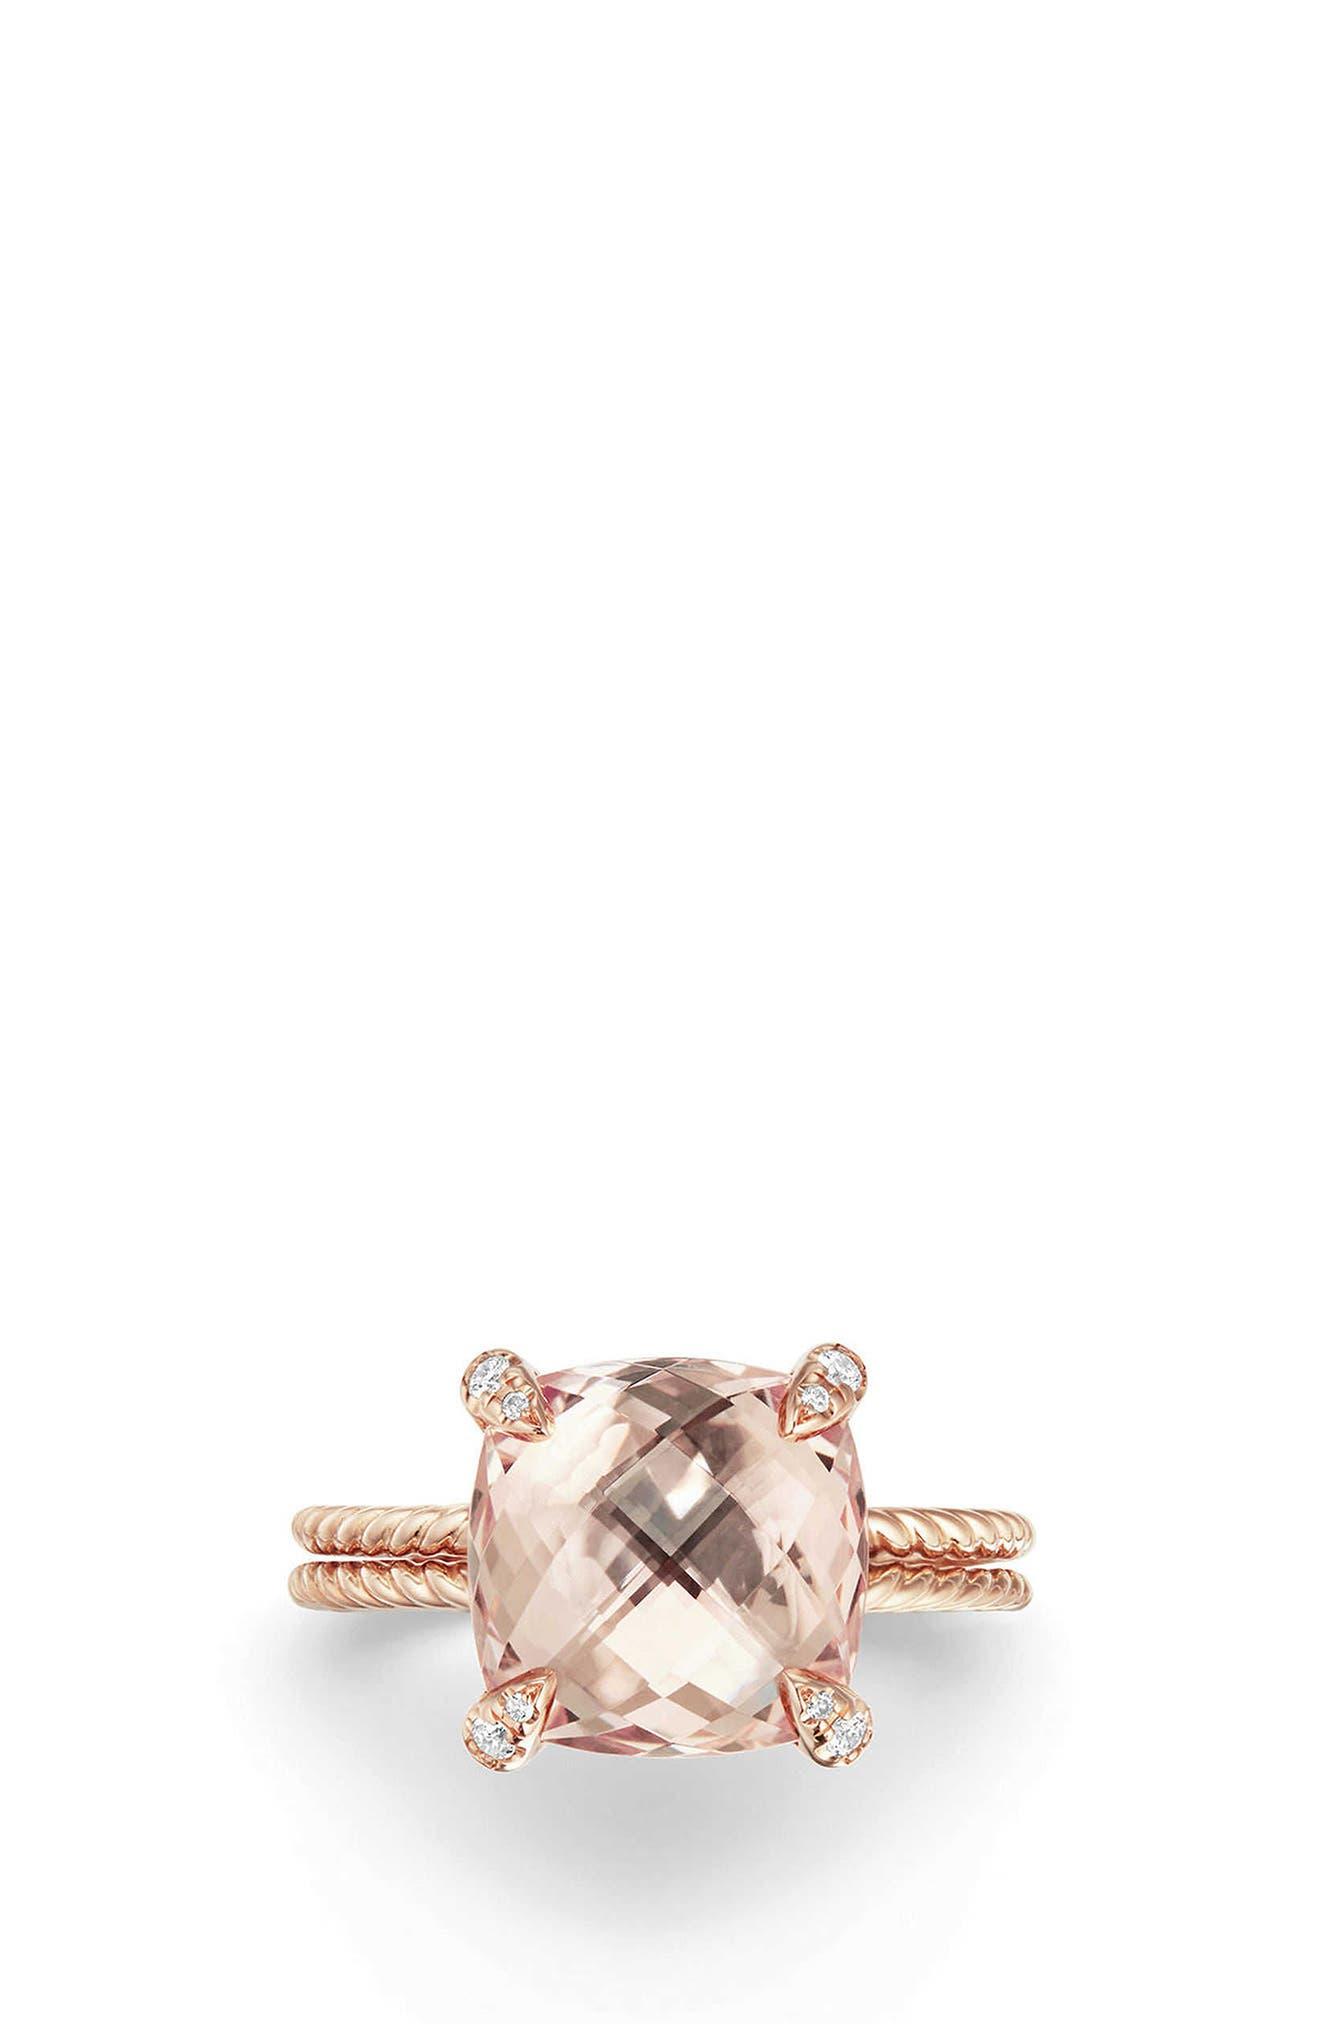 Chatelaine<sup>®</sup> Morganite & Diamond Ring in 18K Rose Gold,                         Main,                         color, Rose Gold/ Diamond/ Morganite